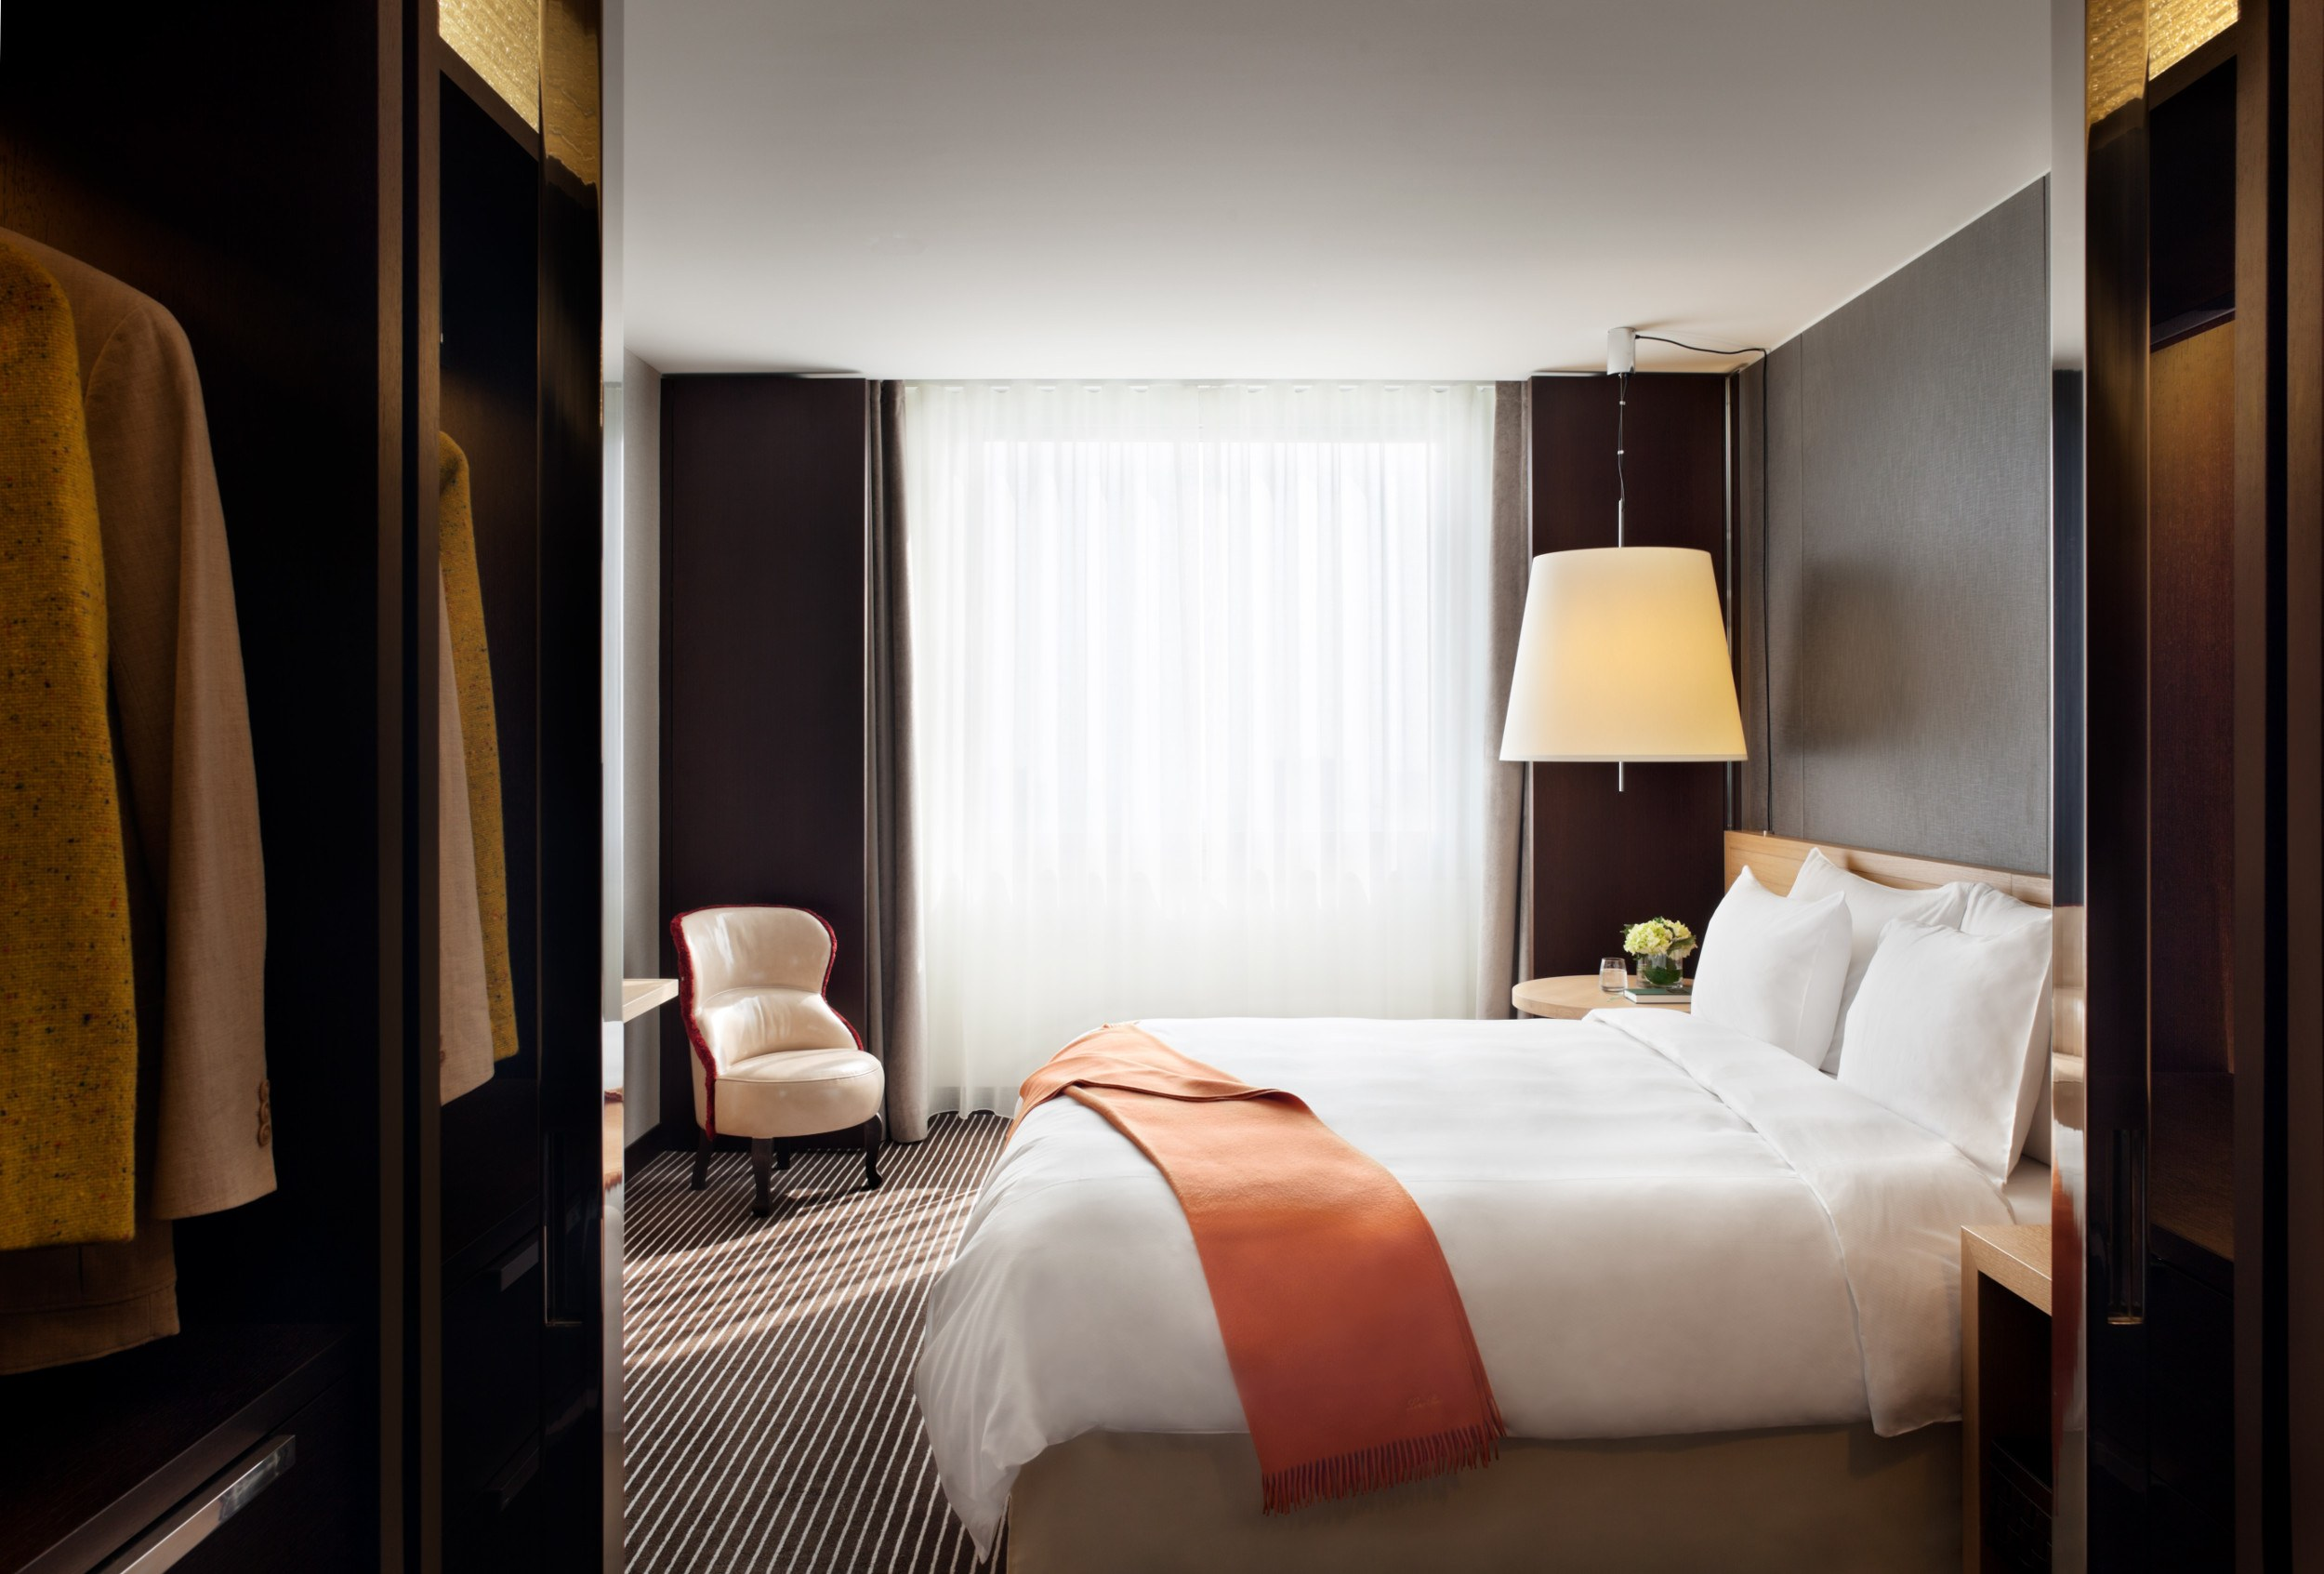 Intercontinental-Geneve-Suisse-hotel-room